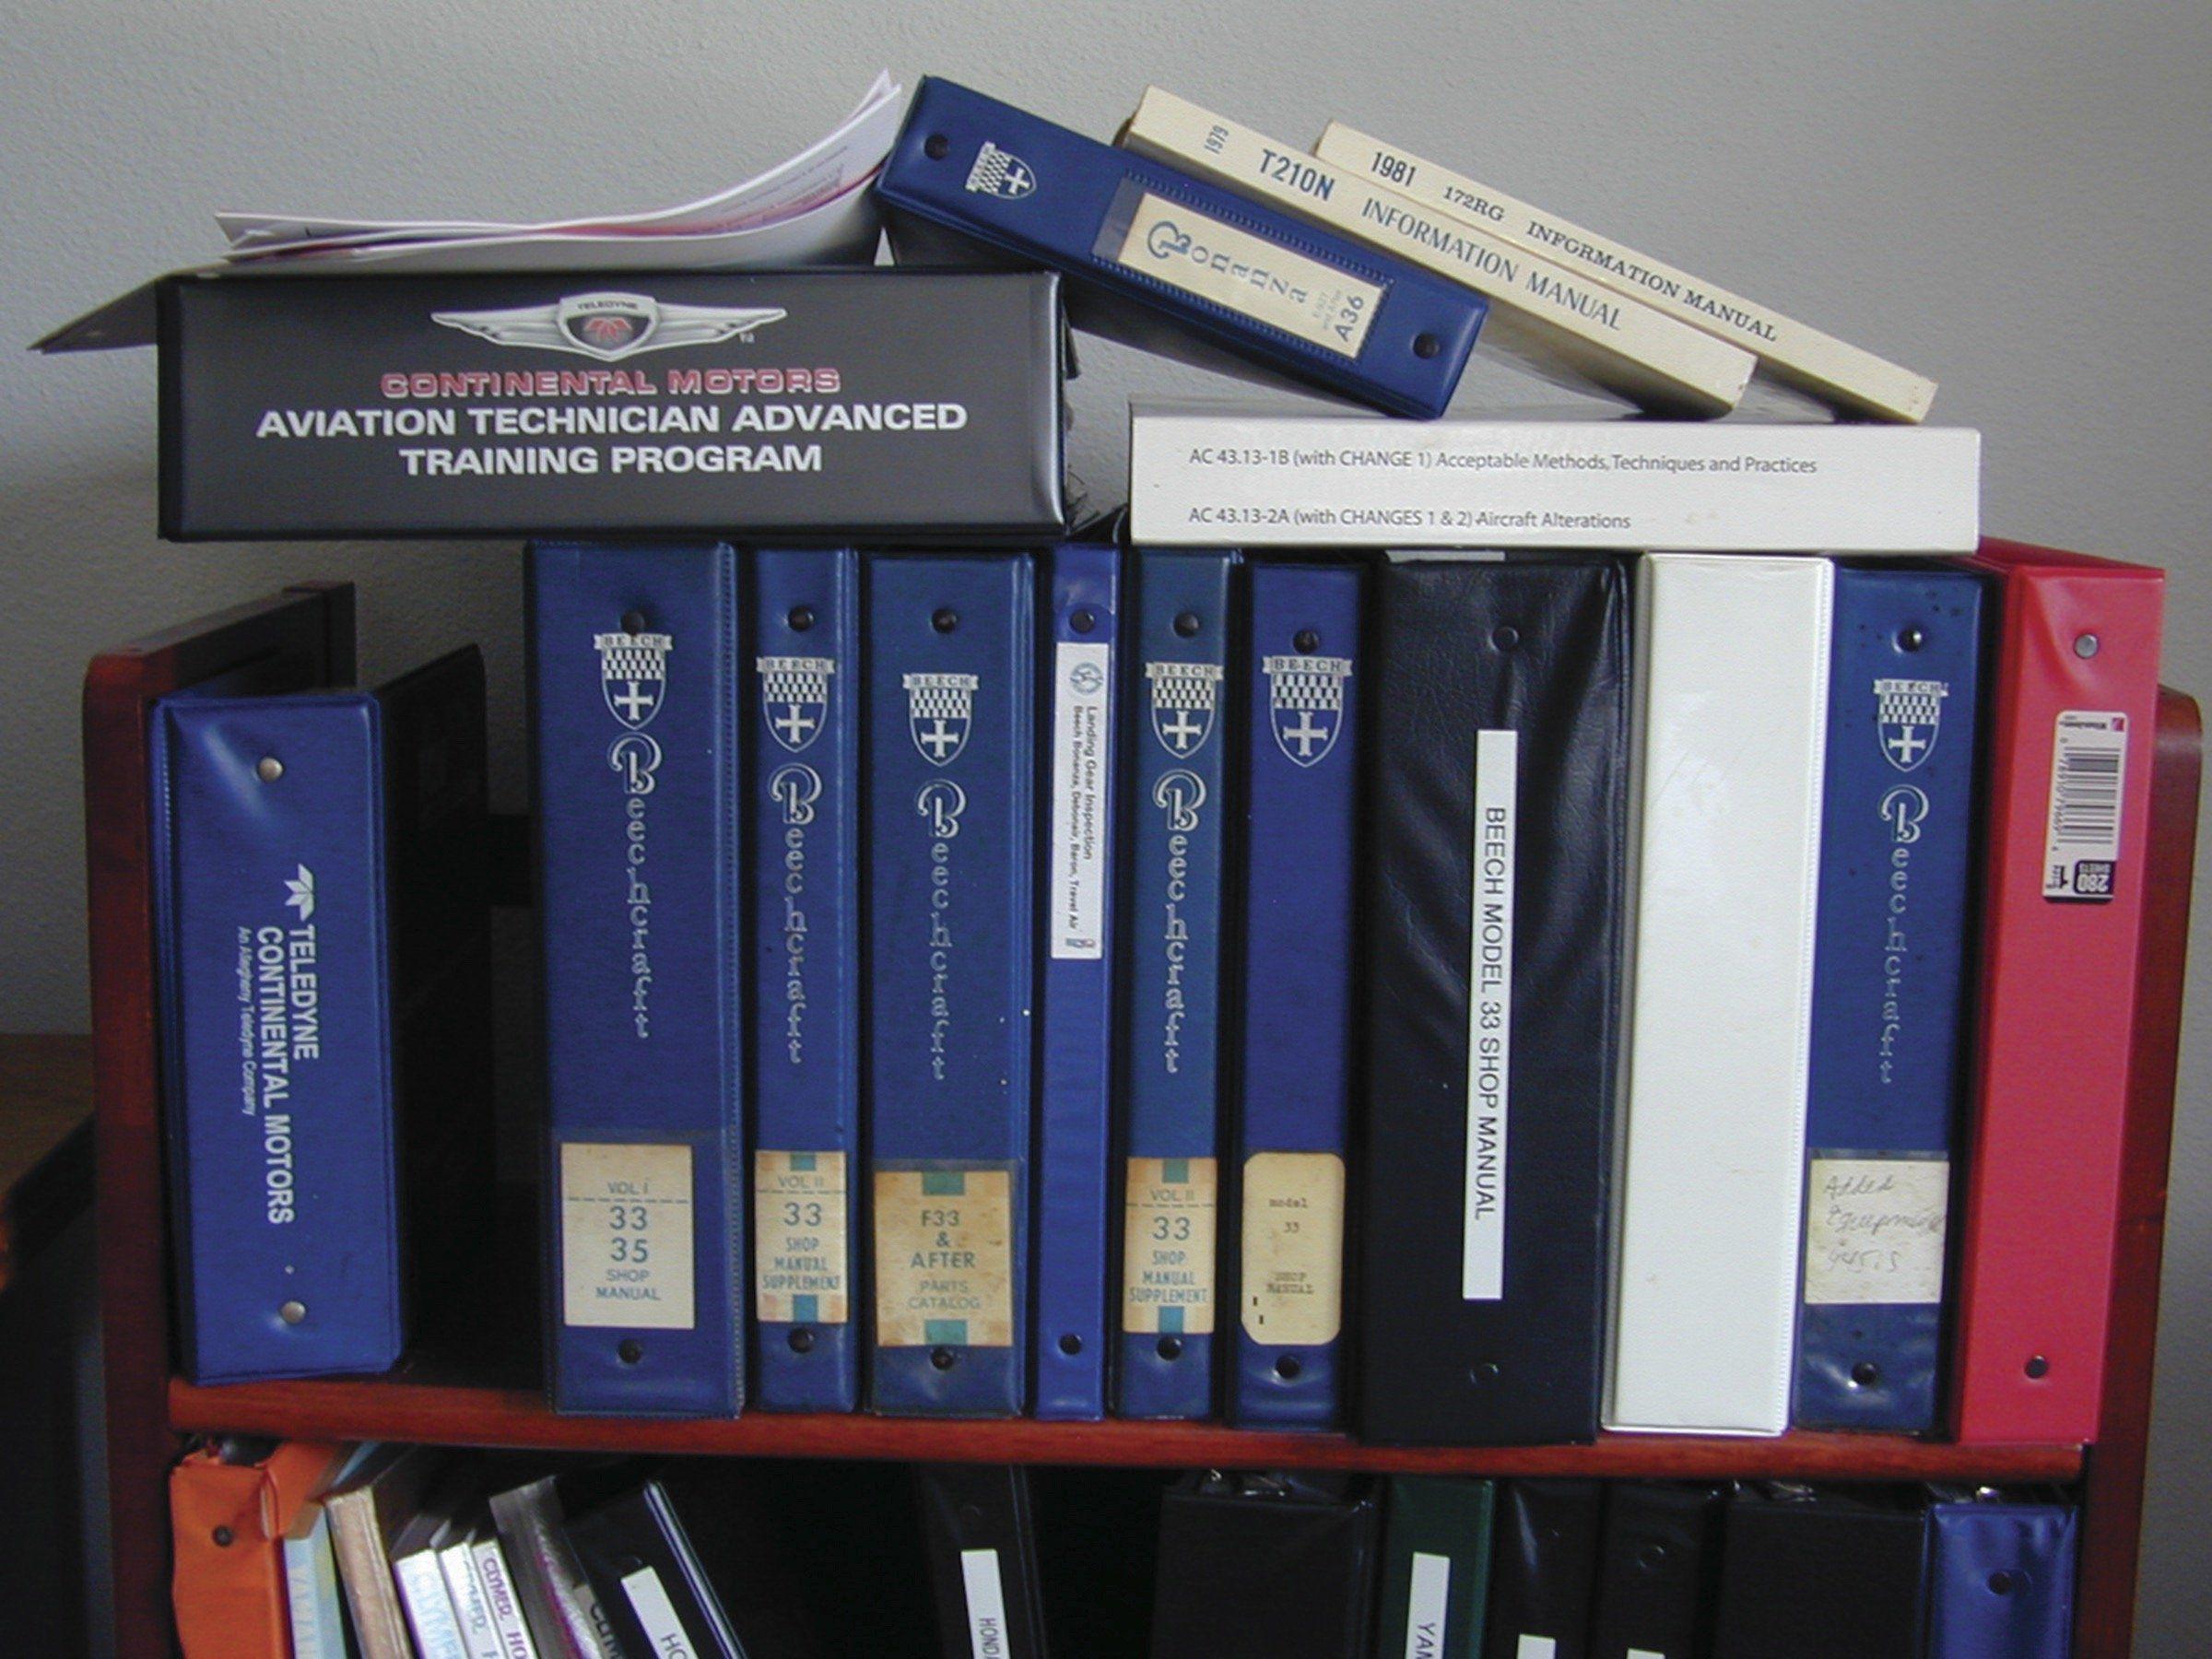 DSCN1842_MaintenanceBookshelf